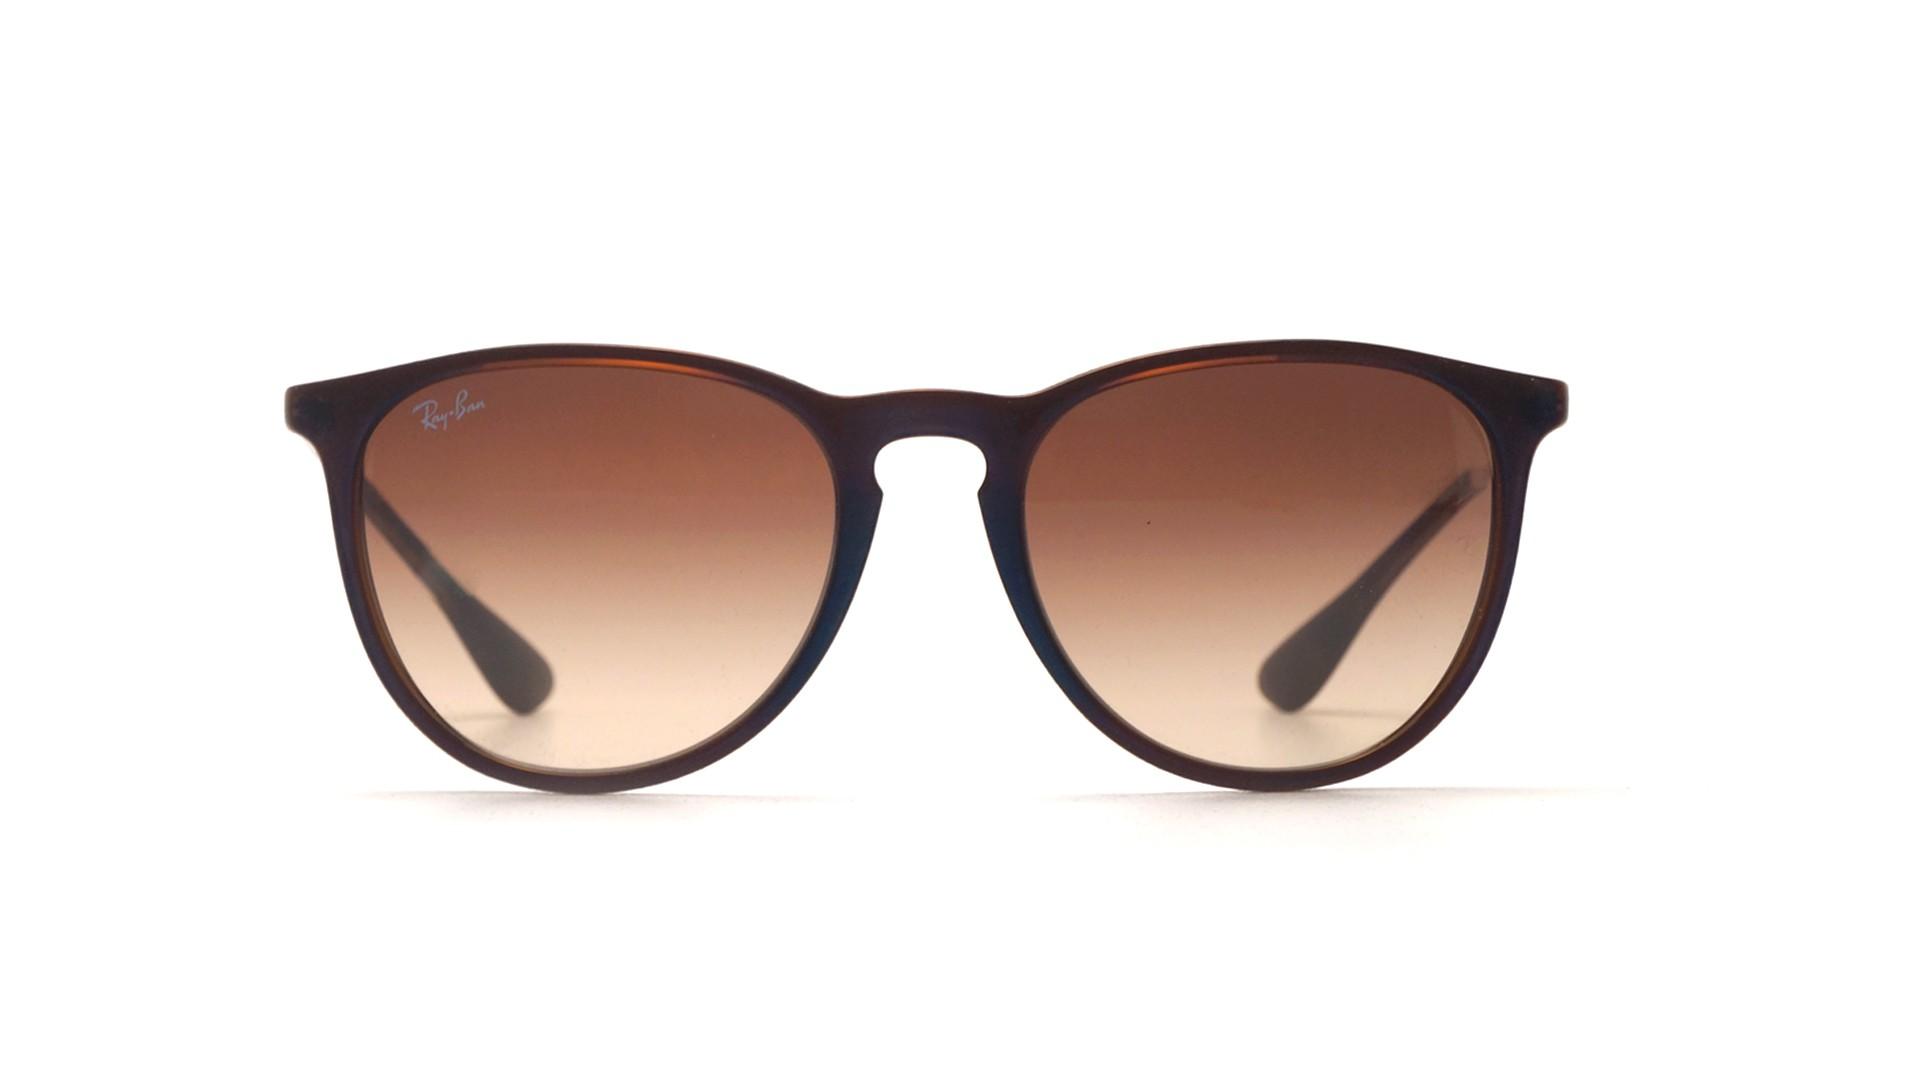 3a25b2ebcd7113 Sunglasses Ray-Ban Erika Brown RB4171 6315 13 54-18 Medium Gradient